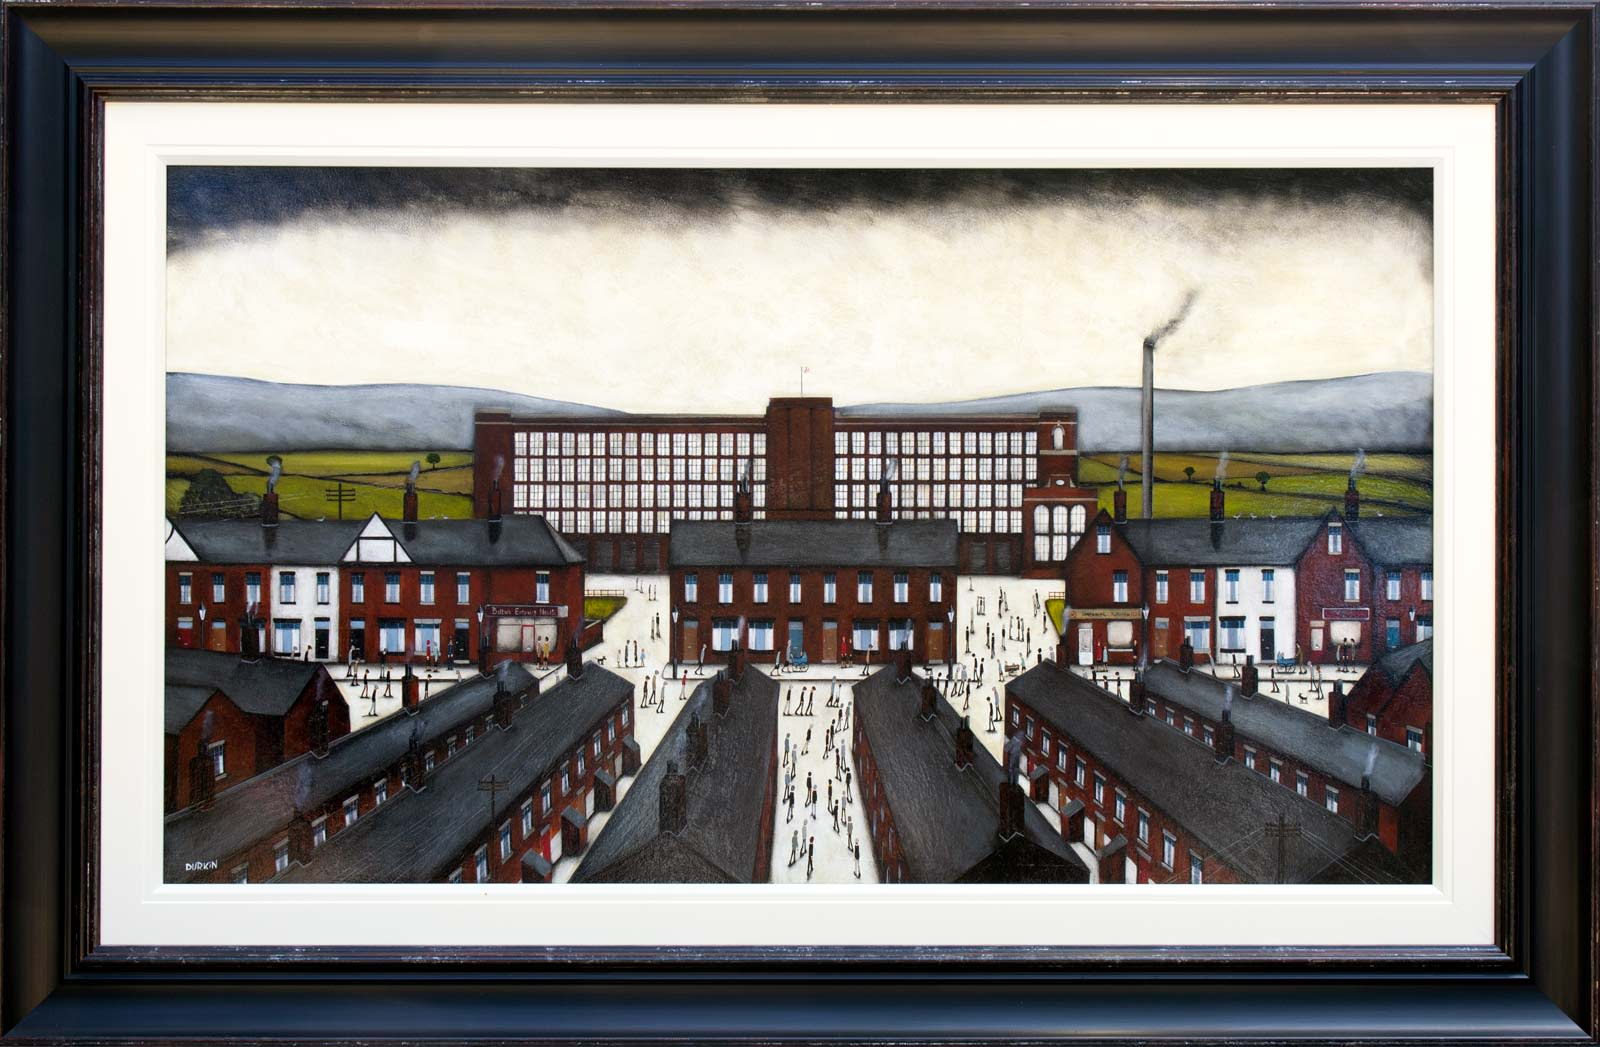 Dove Mill, Sean Durkin